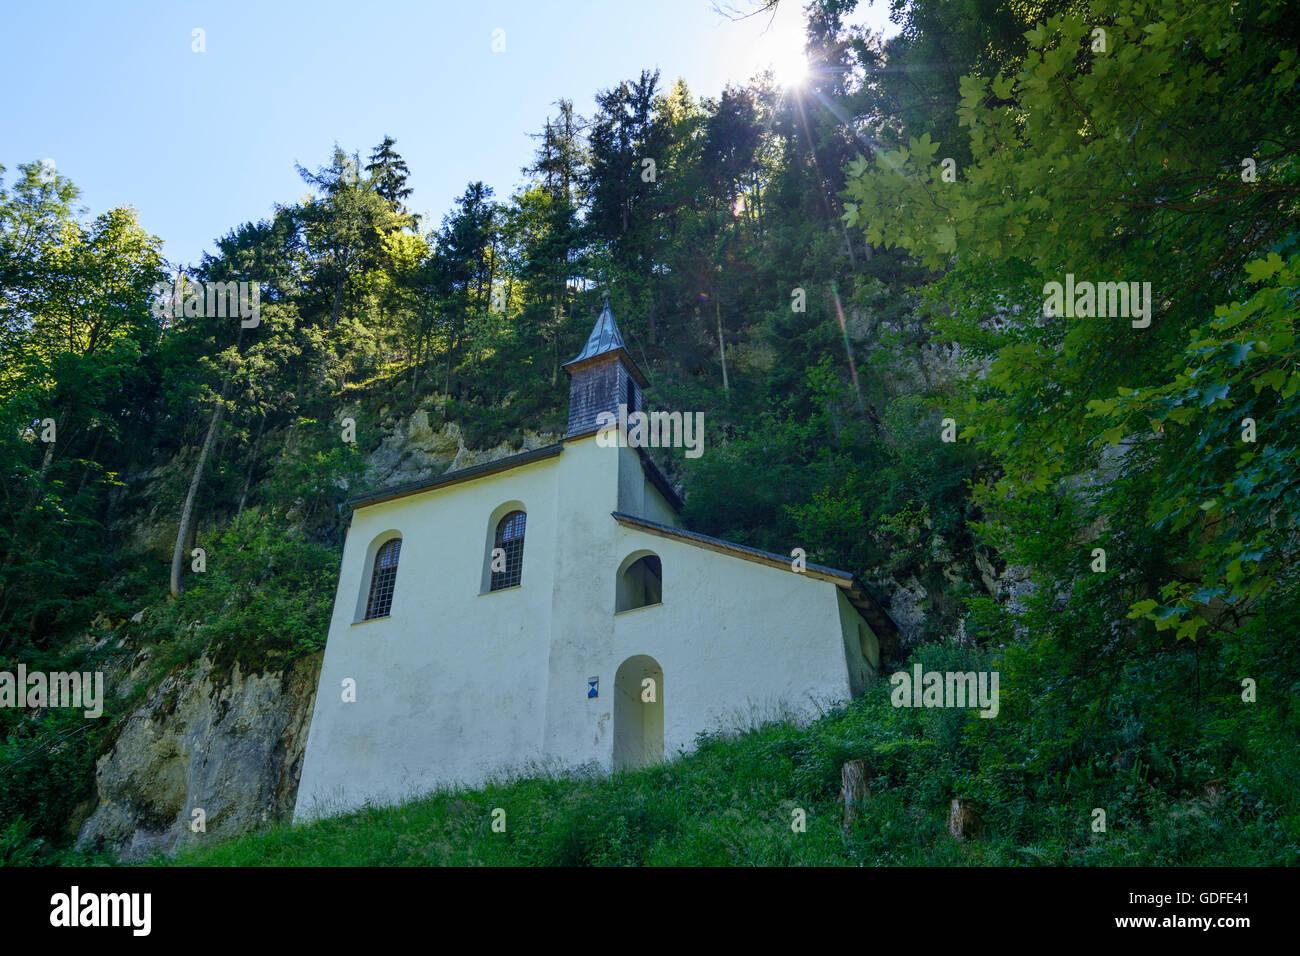 Sankt Gilgen: church Falkensteinkirche, Austria, Salzburg, Salzkammergut - Stock Image